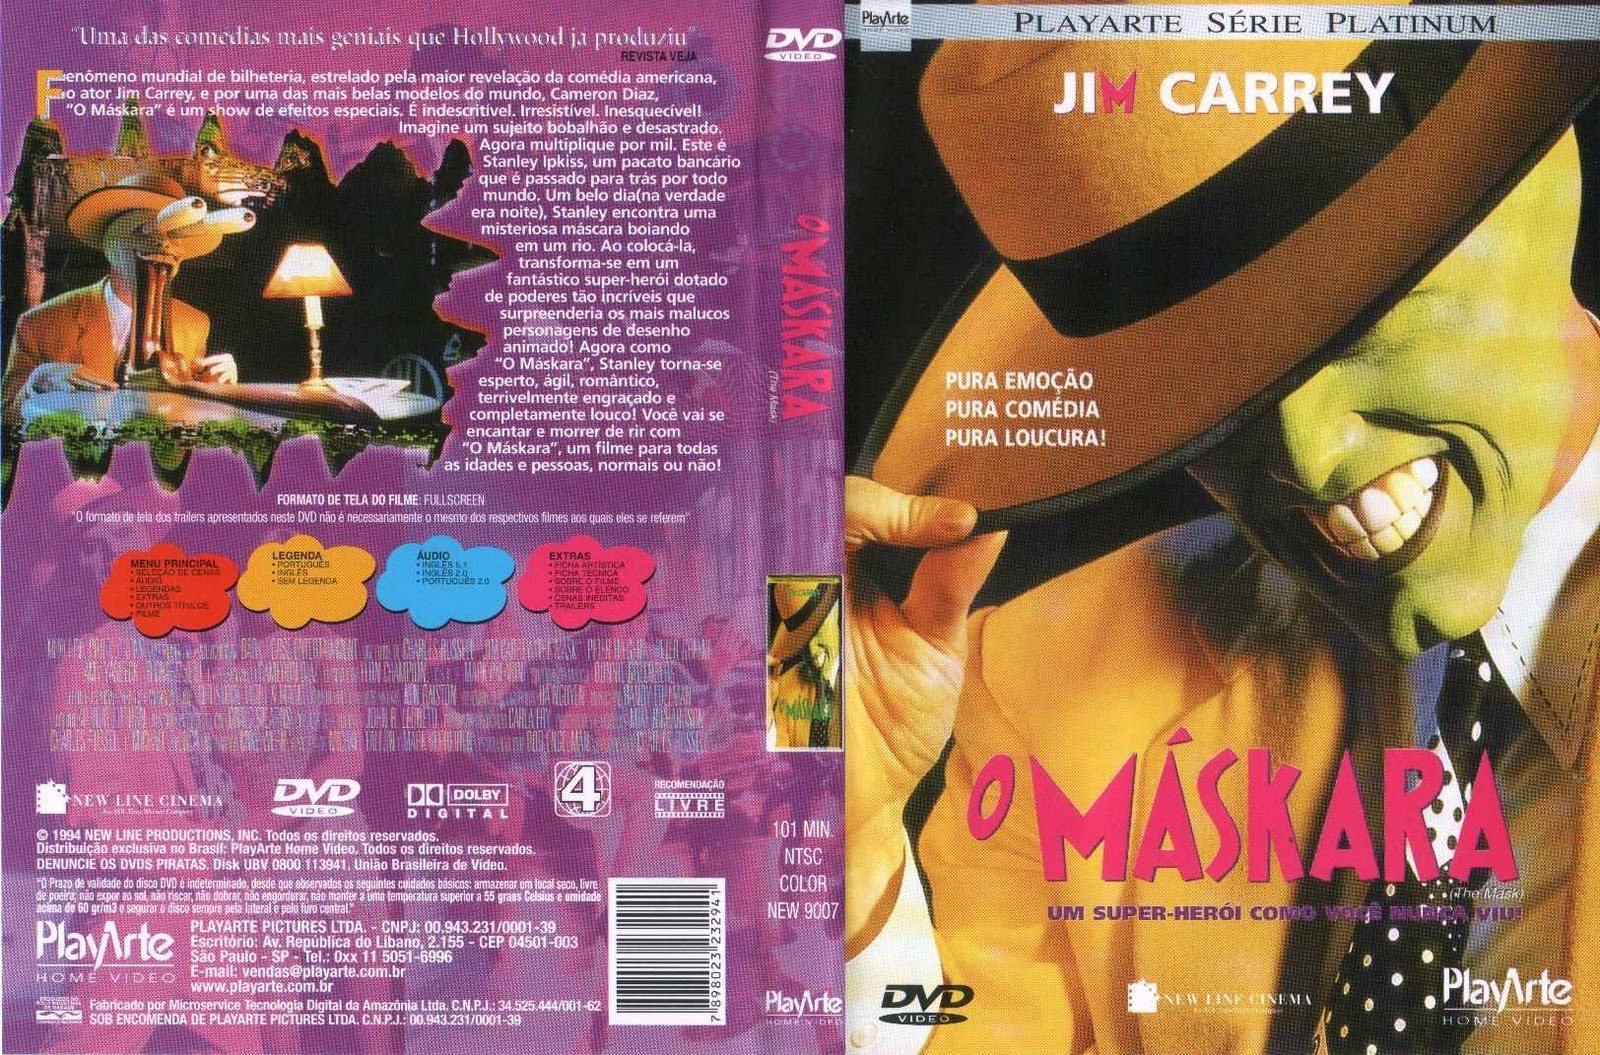 http://2.bp.blogspot.com/-hysMt5CJnrc/TpxKGewaArI/AAAAAAAABC8/OmYsswnYYmk/s1600/the_mask_brazilian-cdcovers_cc-front.jpg